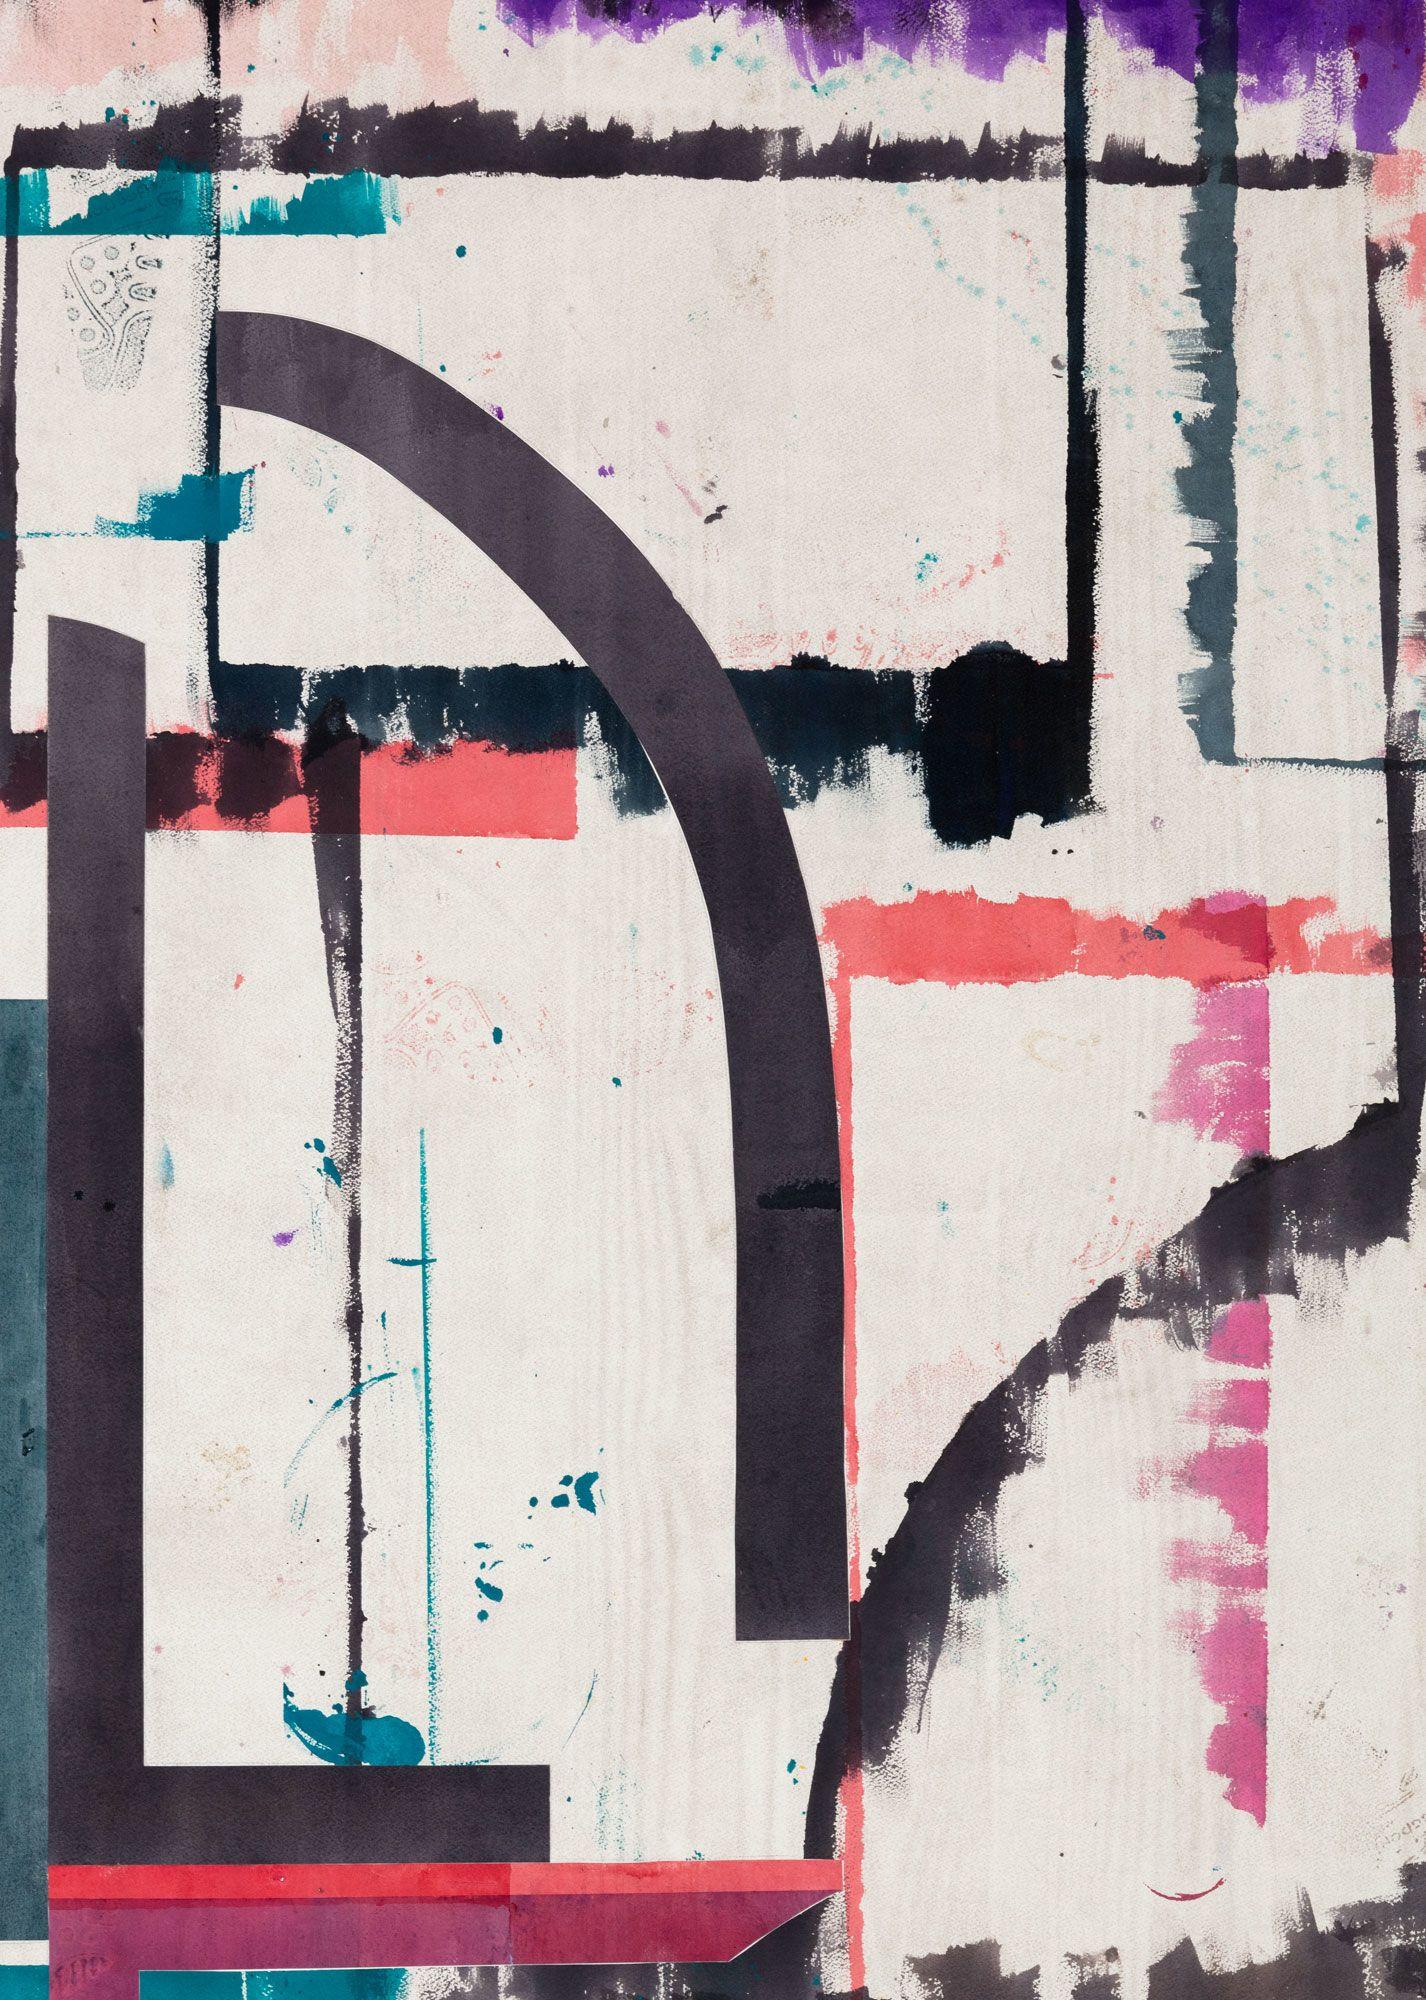 Untitled (floor paper, outlines, curves, edges), details